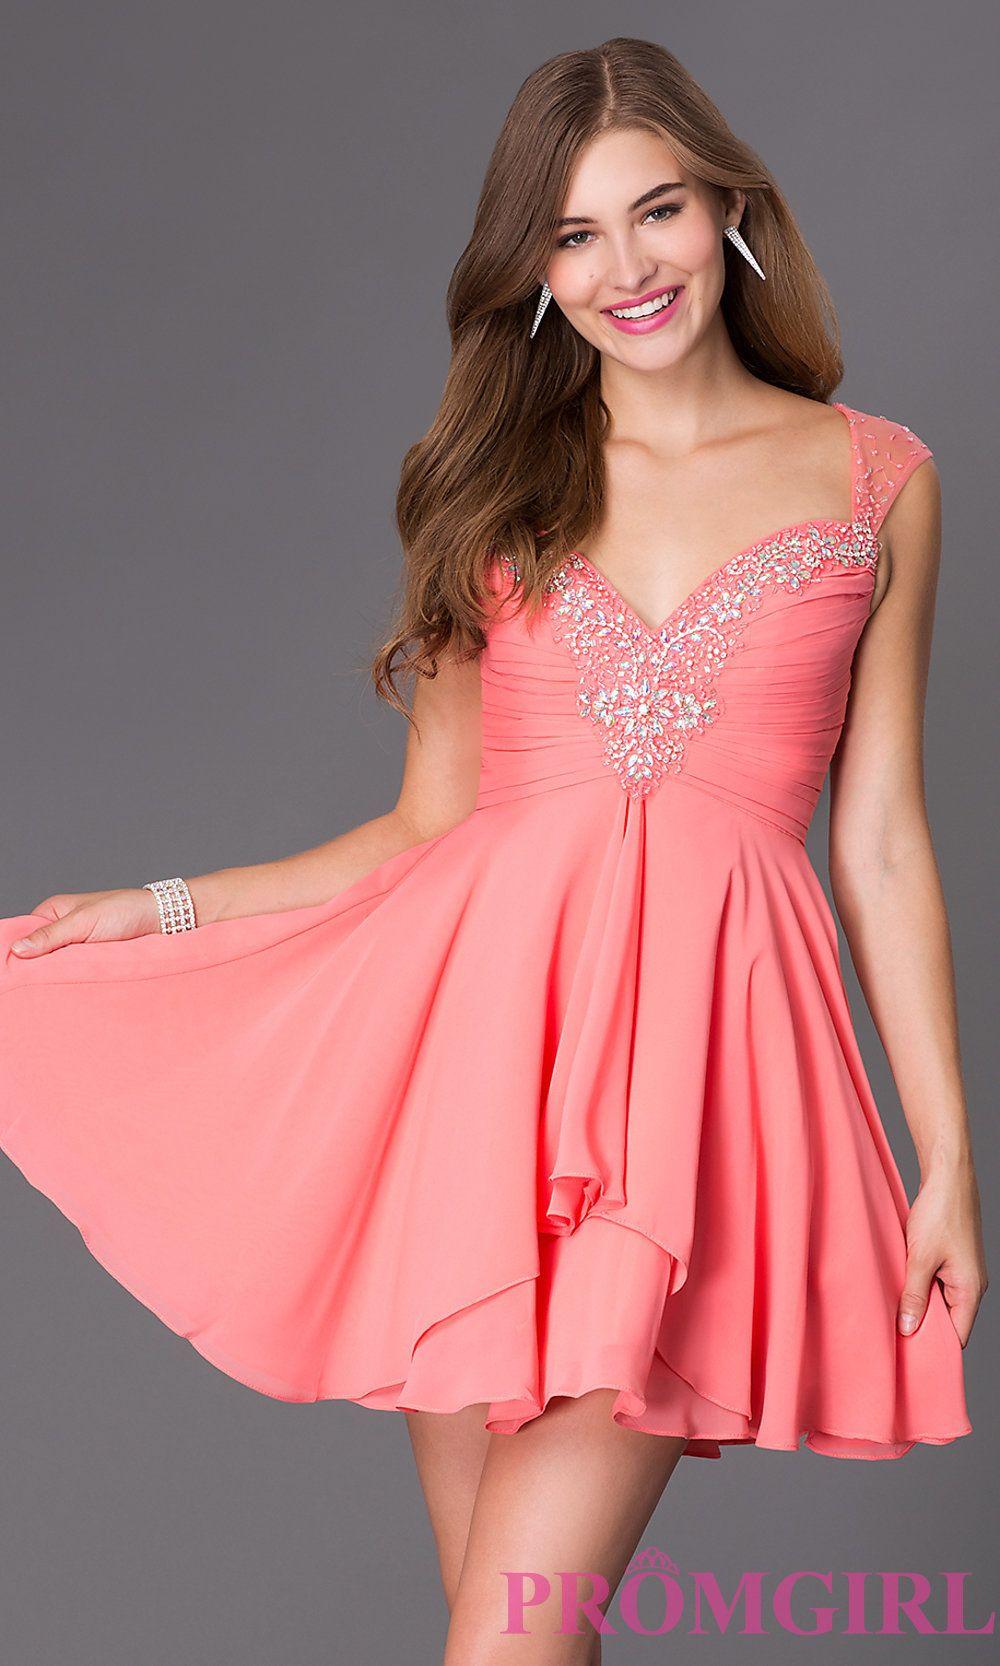 swatch_attribute_602085 | R | Pinterest | Sweetheart dress ...